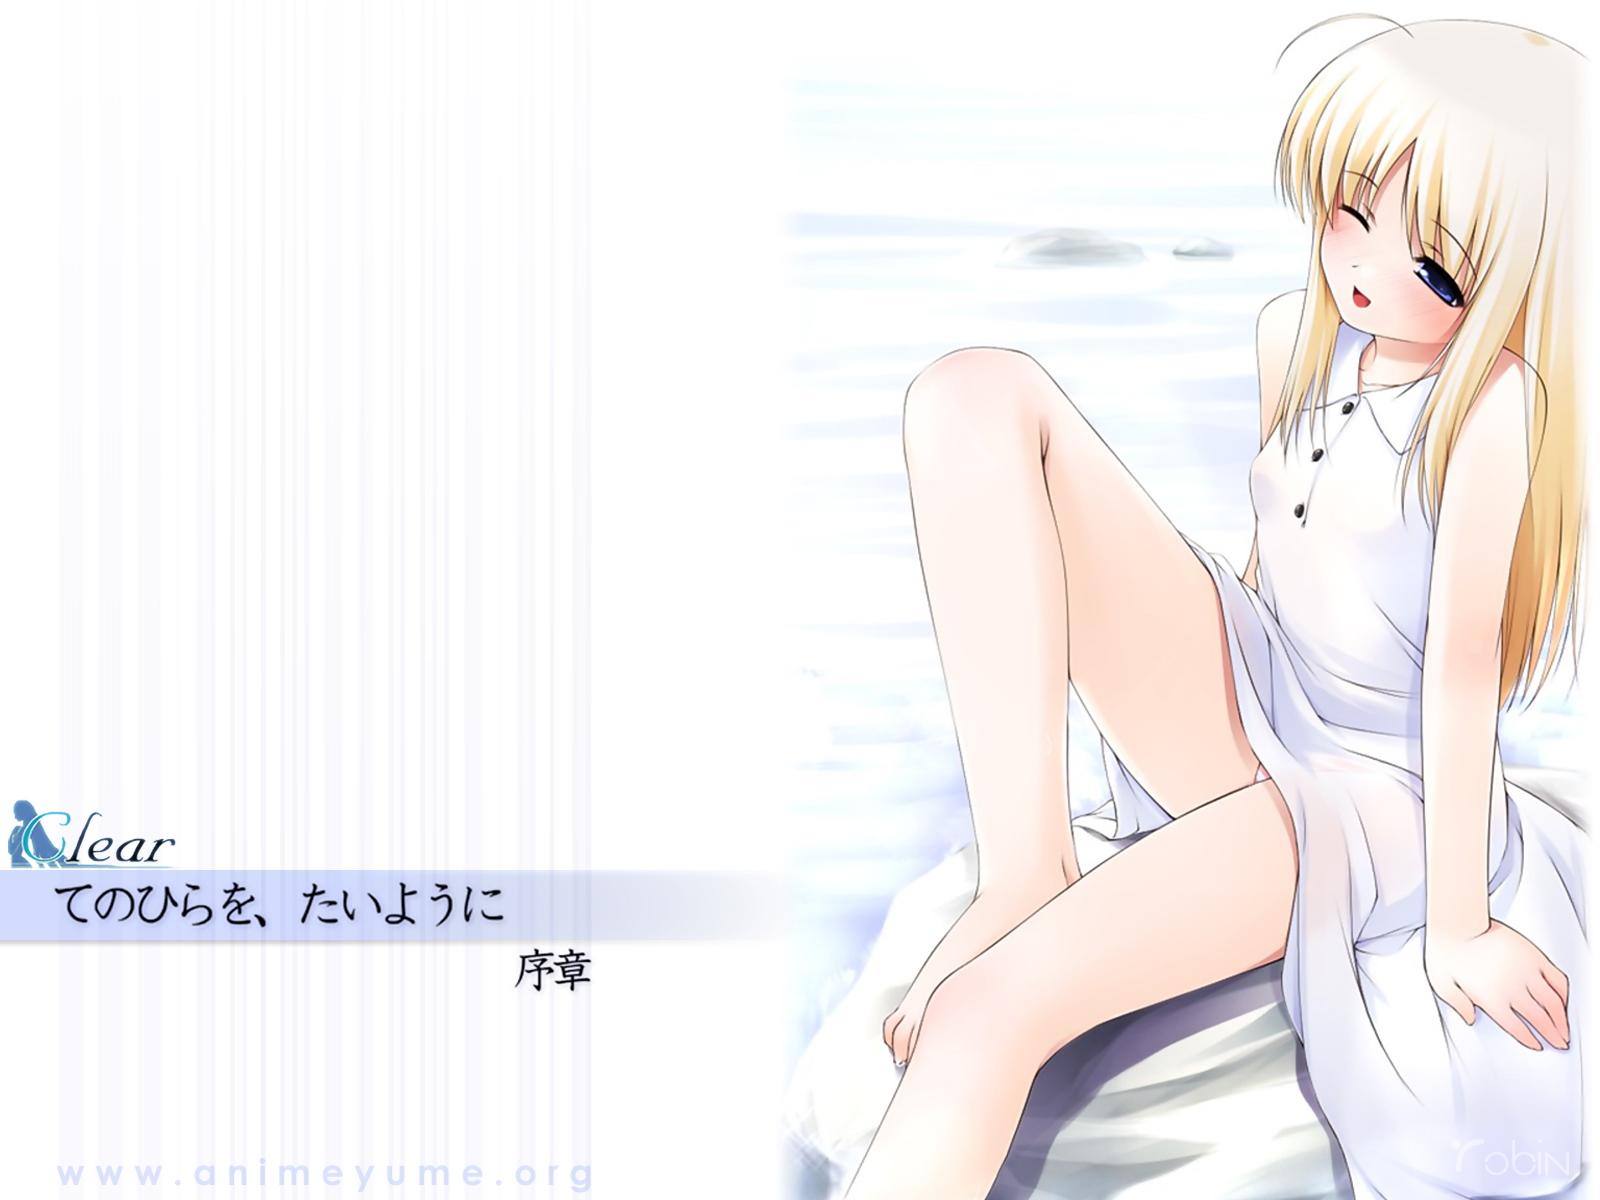 blonde_hair blue_eyes blush dress natunomori_towa ooji te_no_hira_wo_taiyou_ni watermark white wink